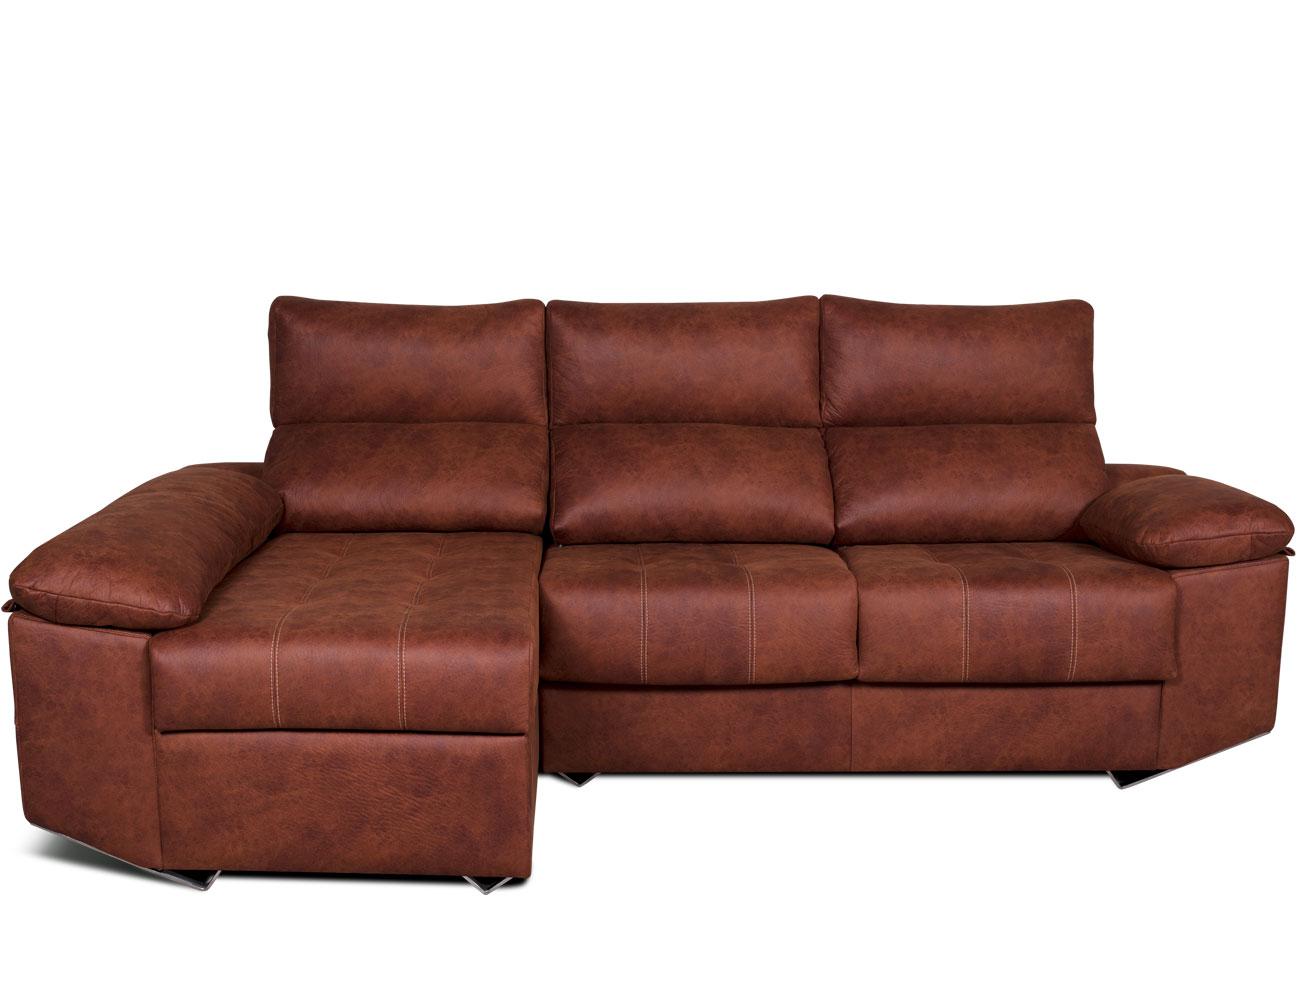 Sofa chaiselongue moderno patas forma tejido anti manchas 23